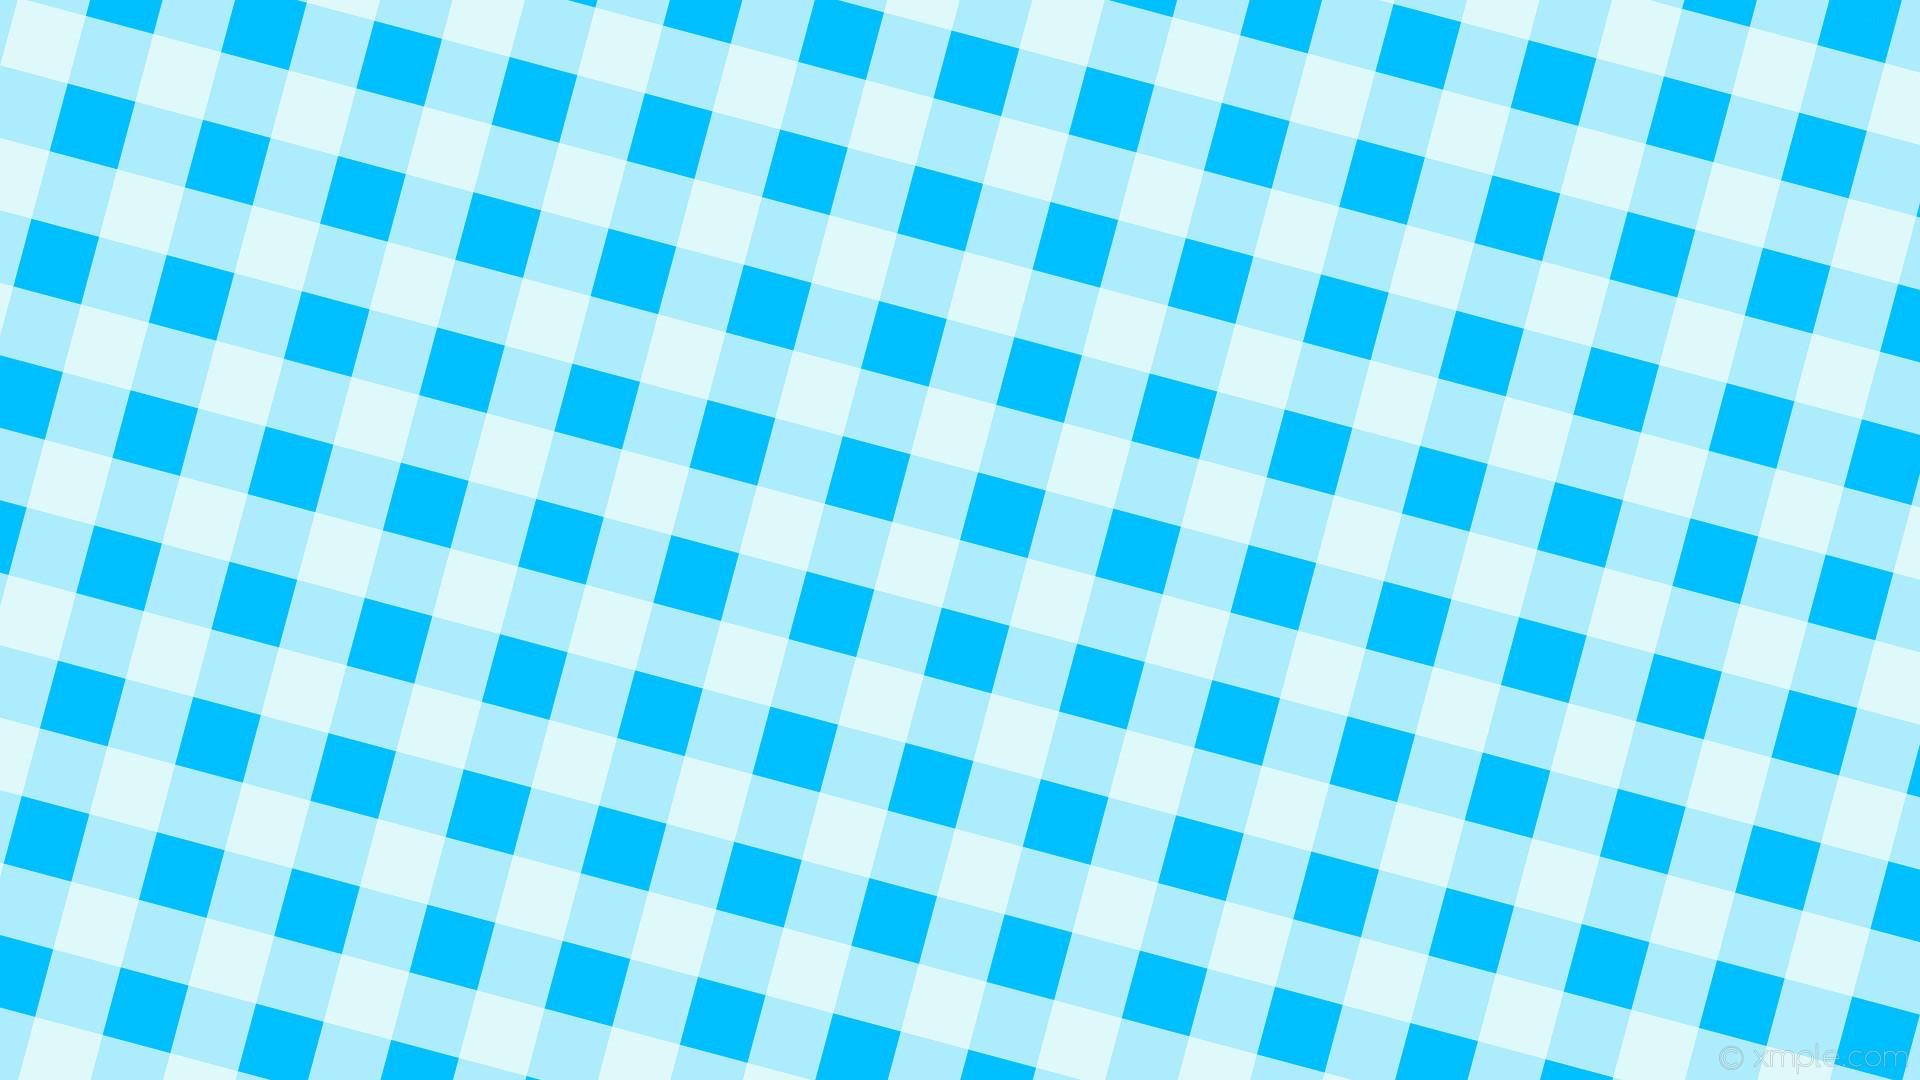 wallpaper striped blue checker white gingham deep sky blue mint cream  #00bfff #f5fffa 255